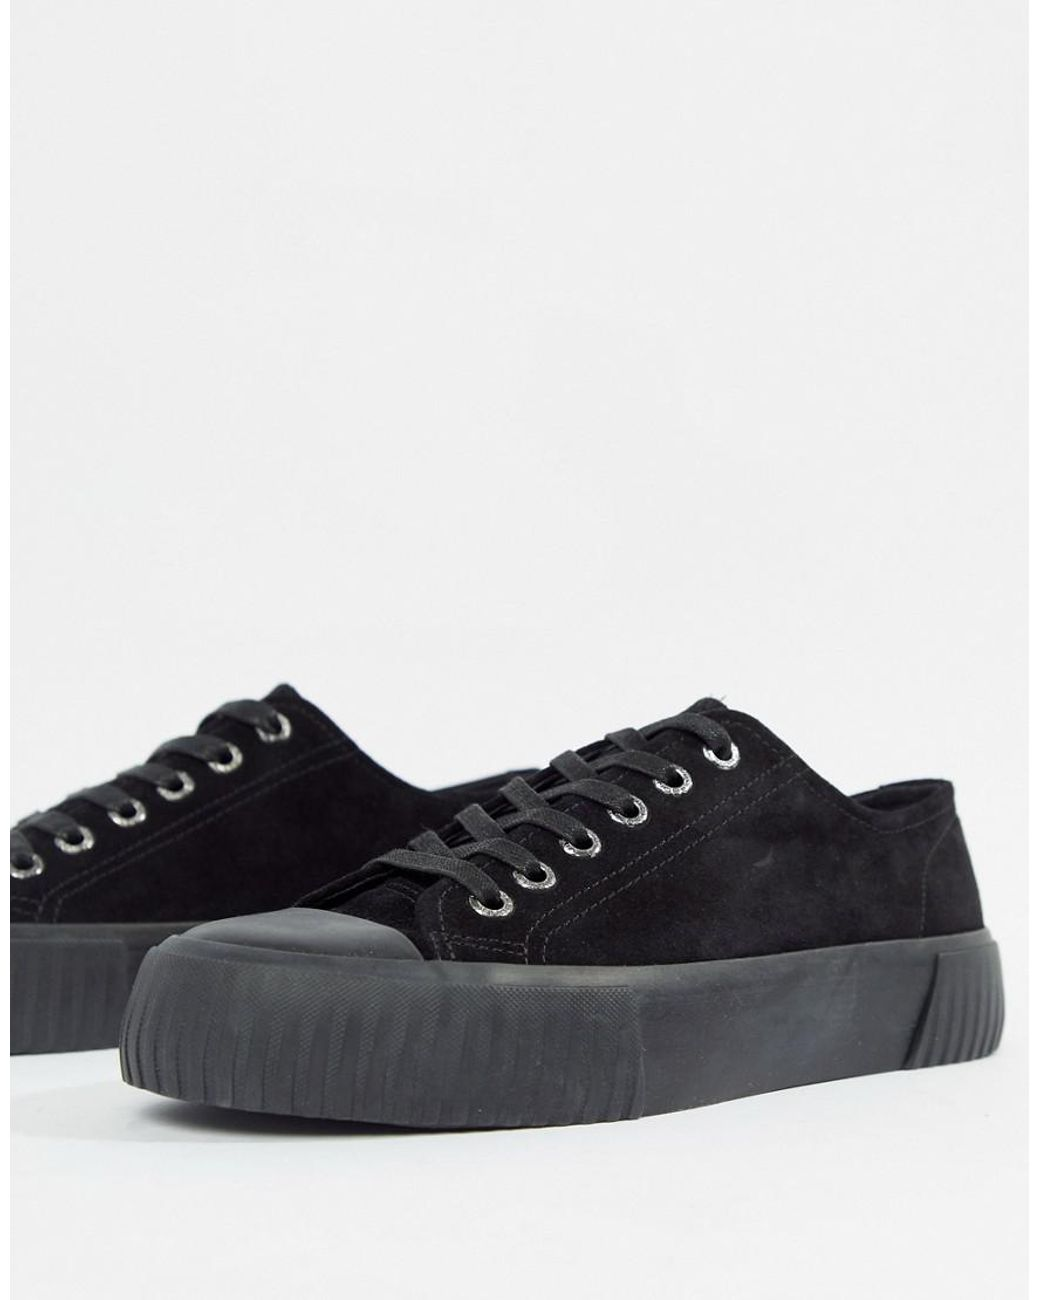 19837f91f8c154 Vagabond Ashley Suede Flatform Sneaker in Black - Lyst